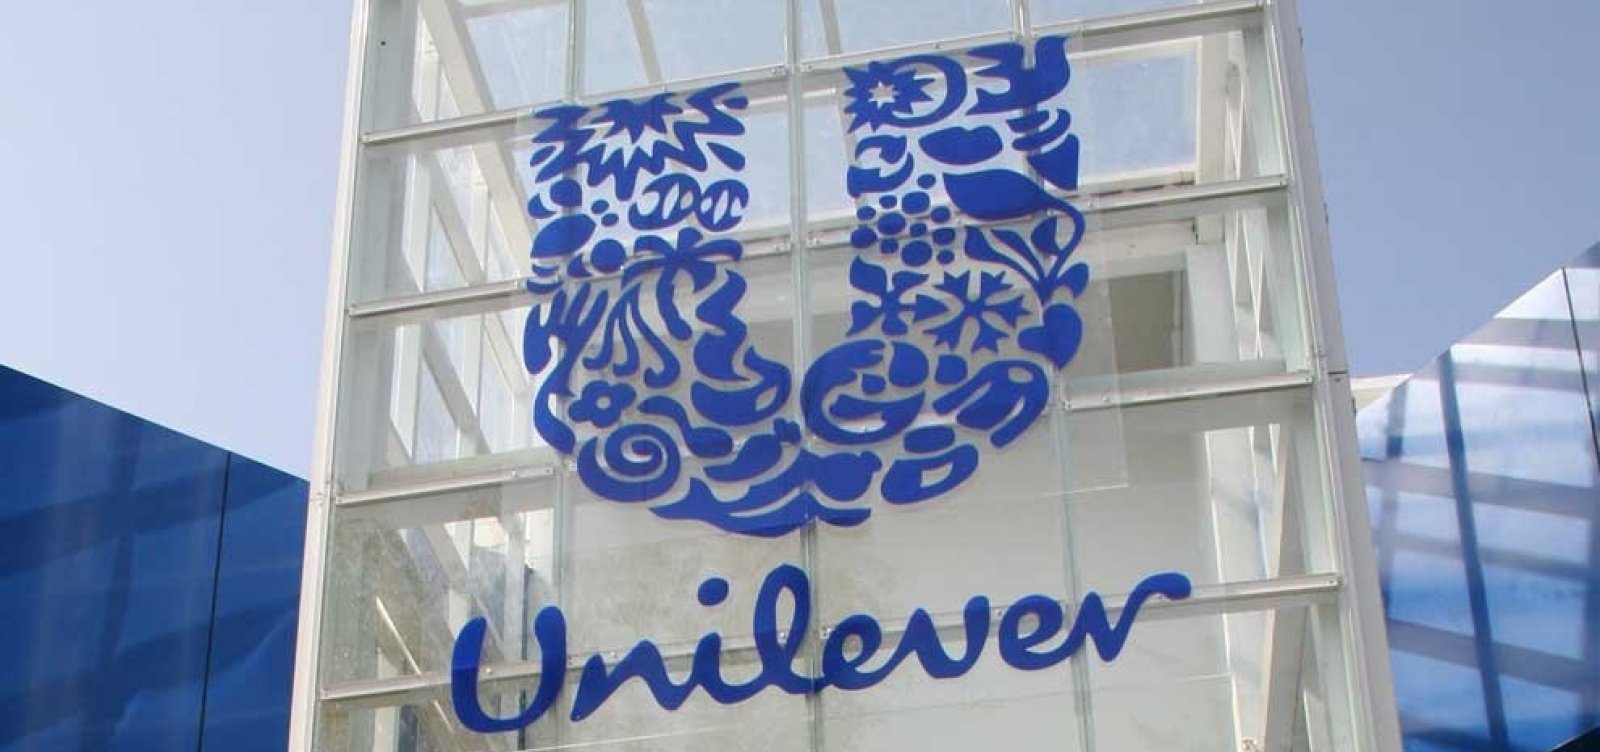 [Cade condena Unilever a pagar R$ 29 mi por contratos de exclusividade]